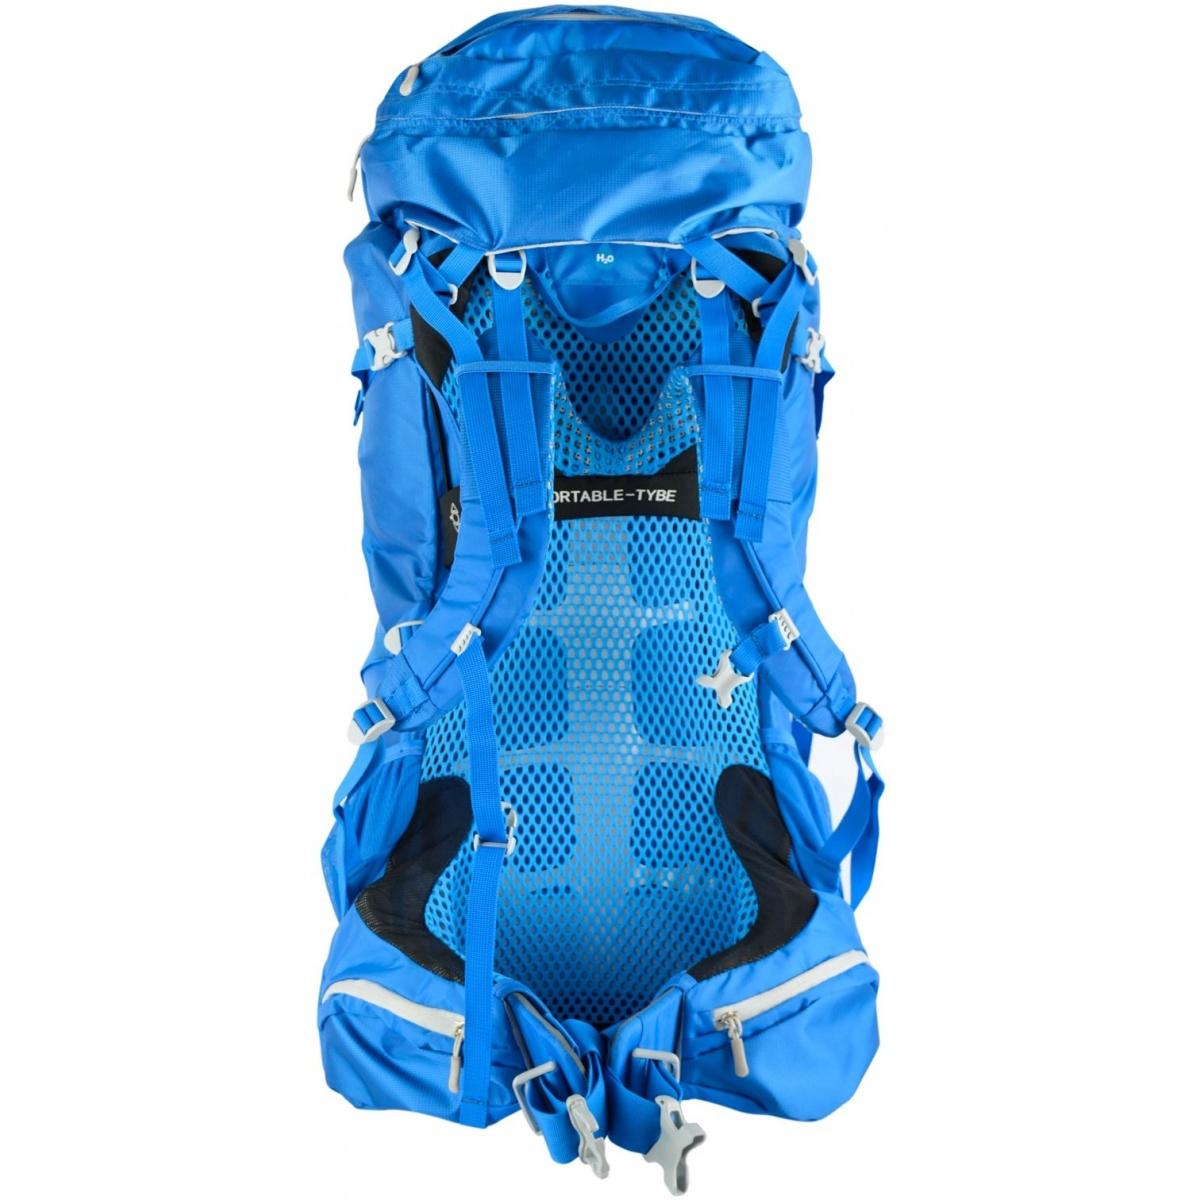 Batoh Expedice - Razor 70l – modrá  b58de8f100